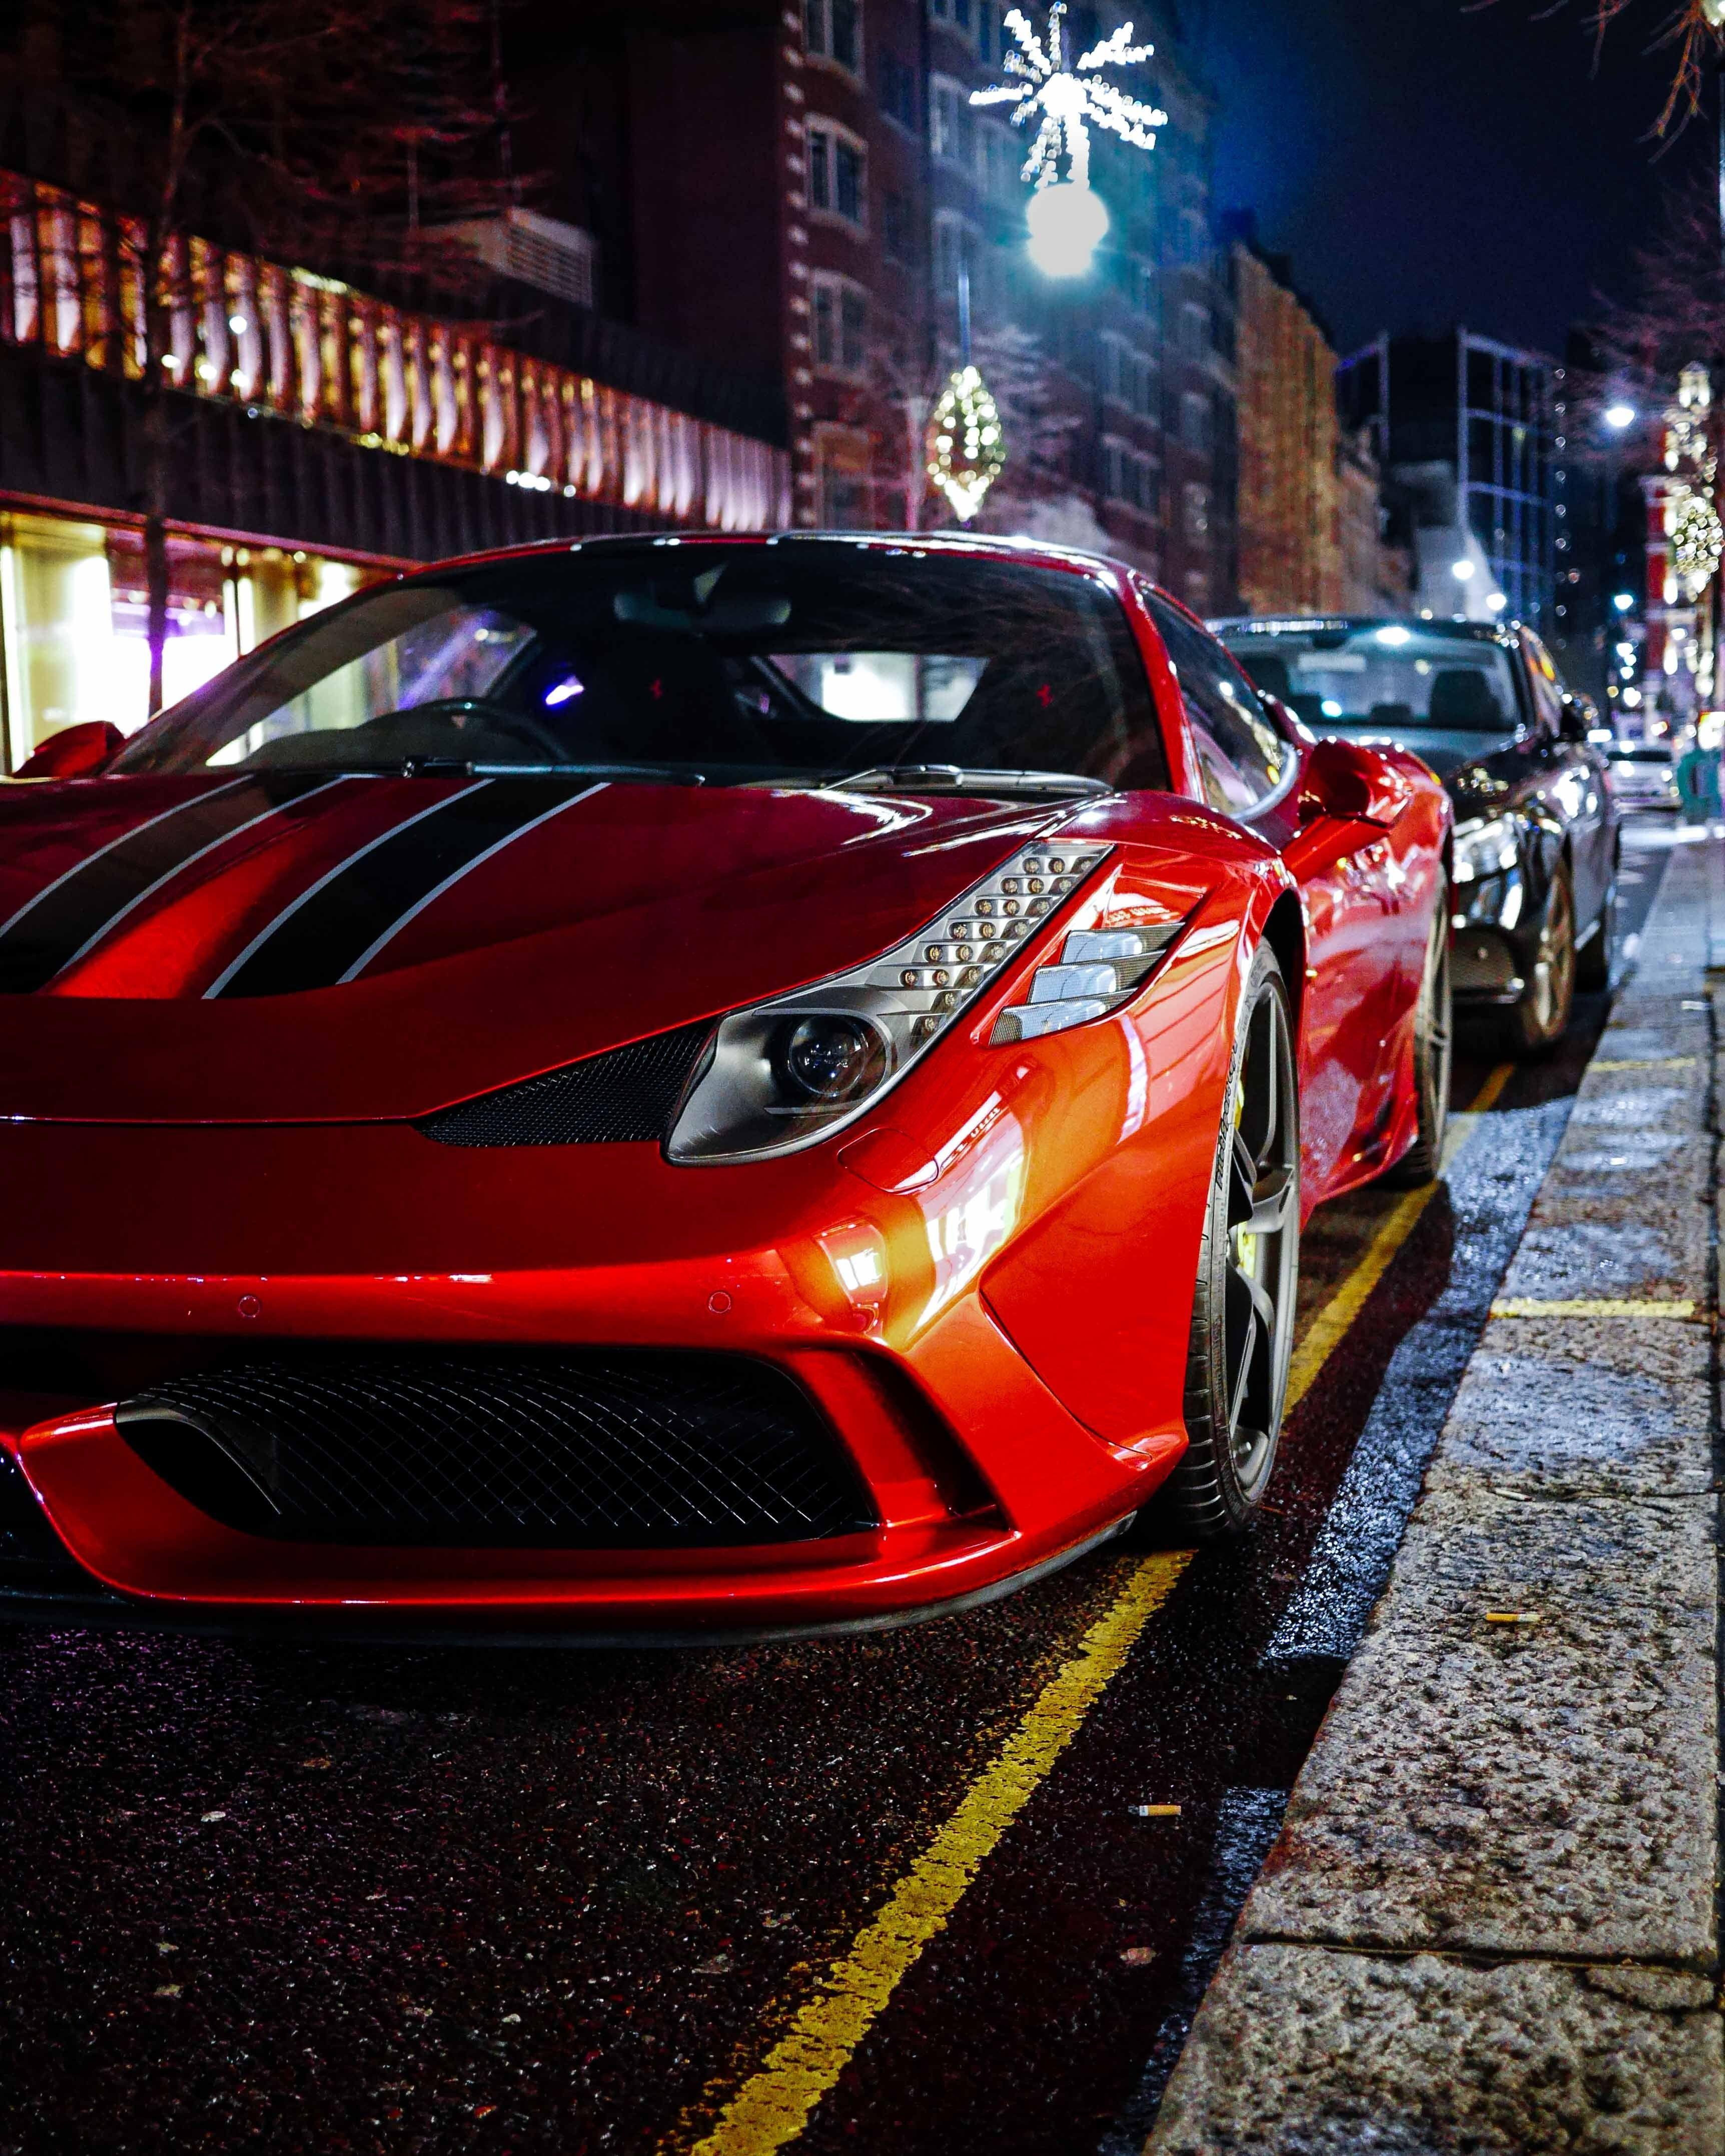 Ferrari 458 Iphone Wallpapers Top Free Ferrari 458 Iphone Backgrounds Wallpaperaccess